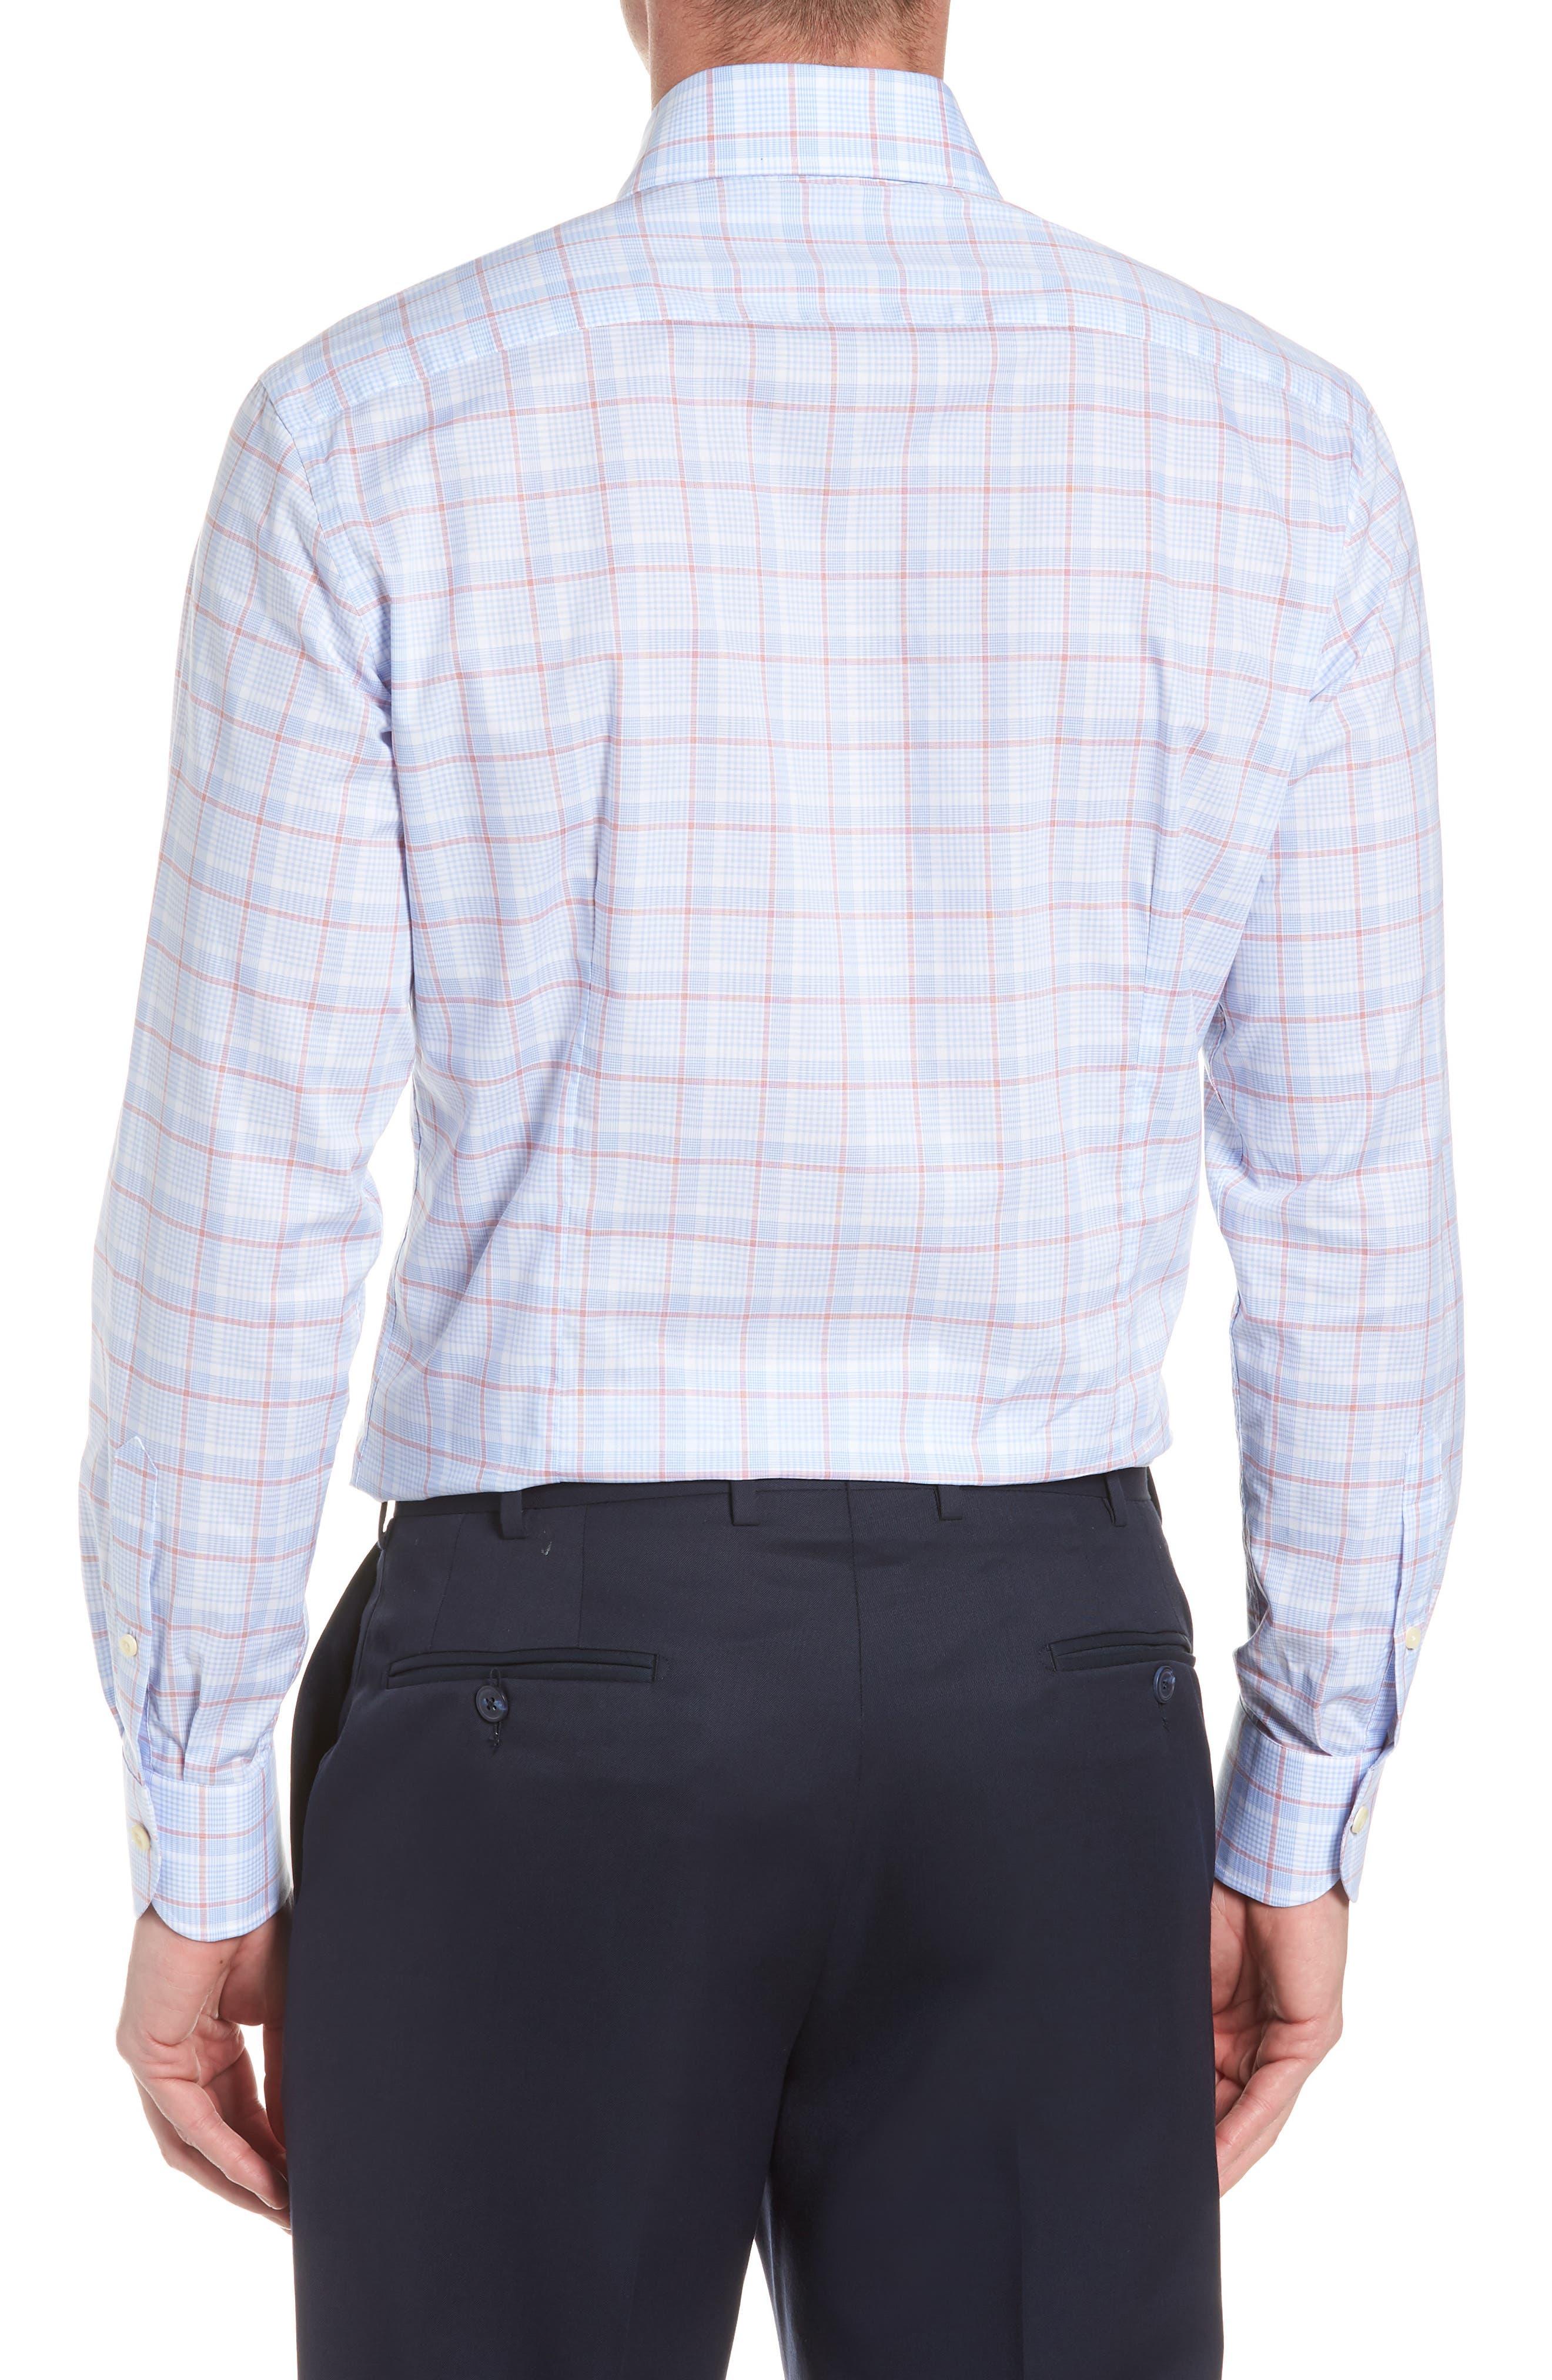 Conwell Slim Fit Plaid Dress Shirt,                             Alternate thumbnail 3, color,                             Blue